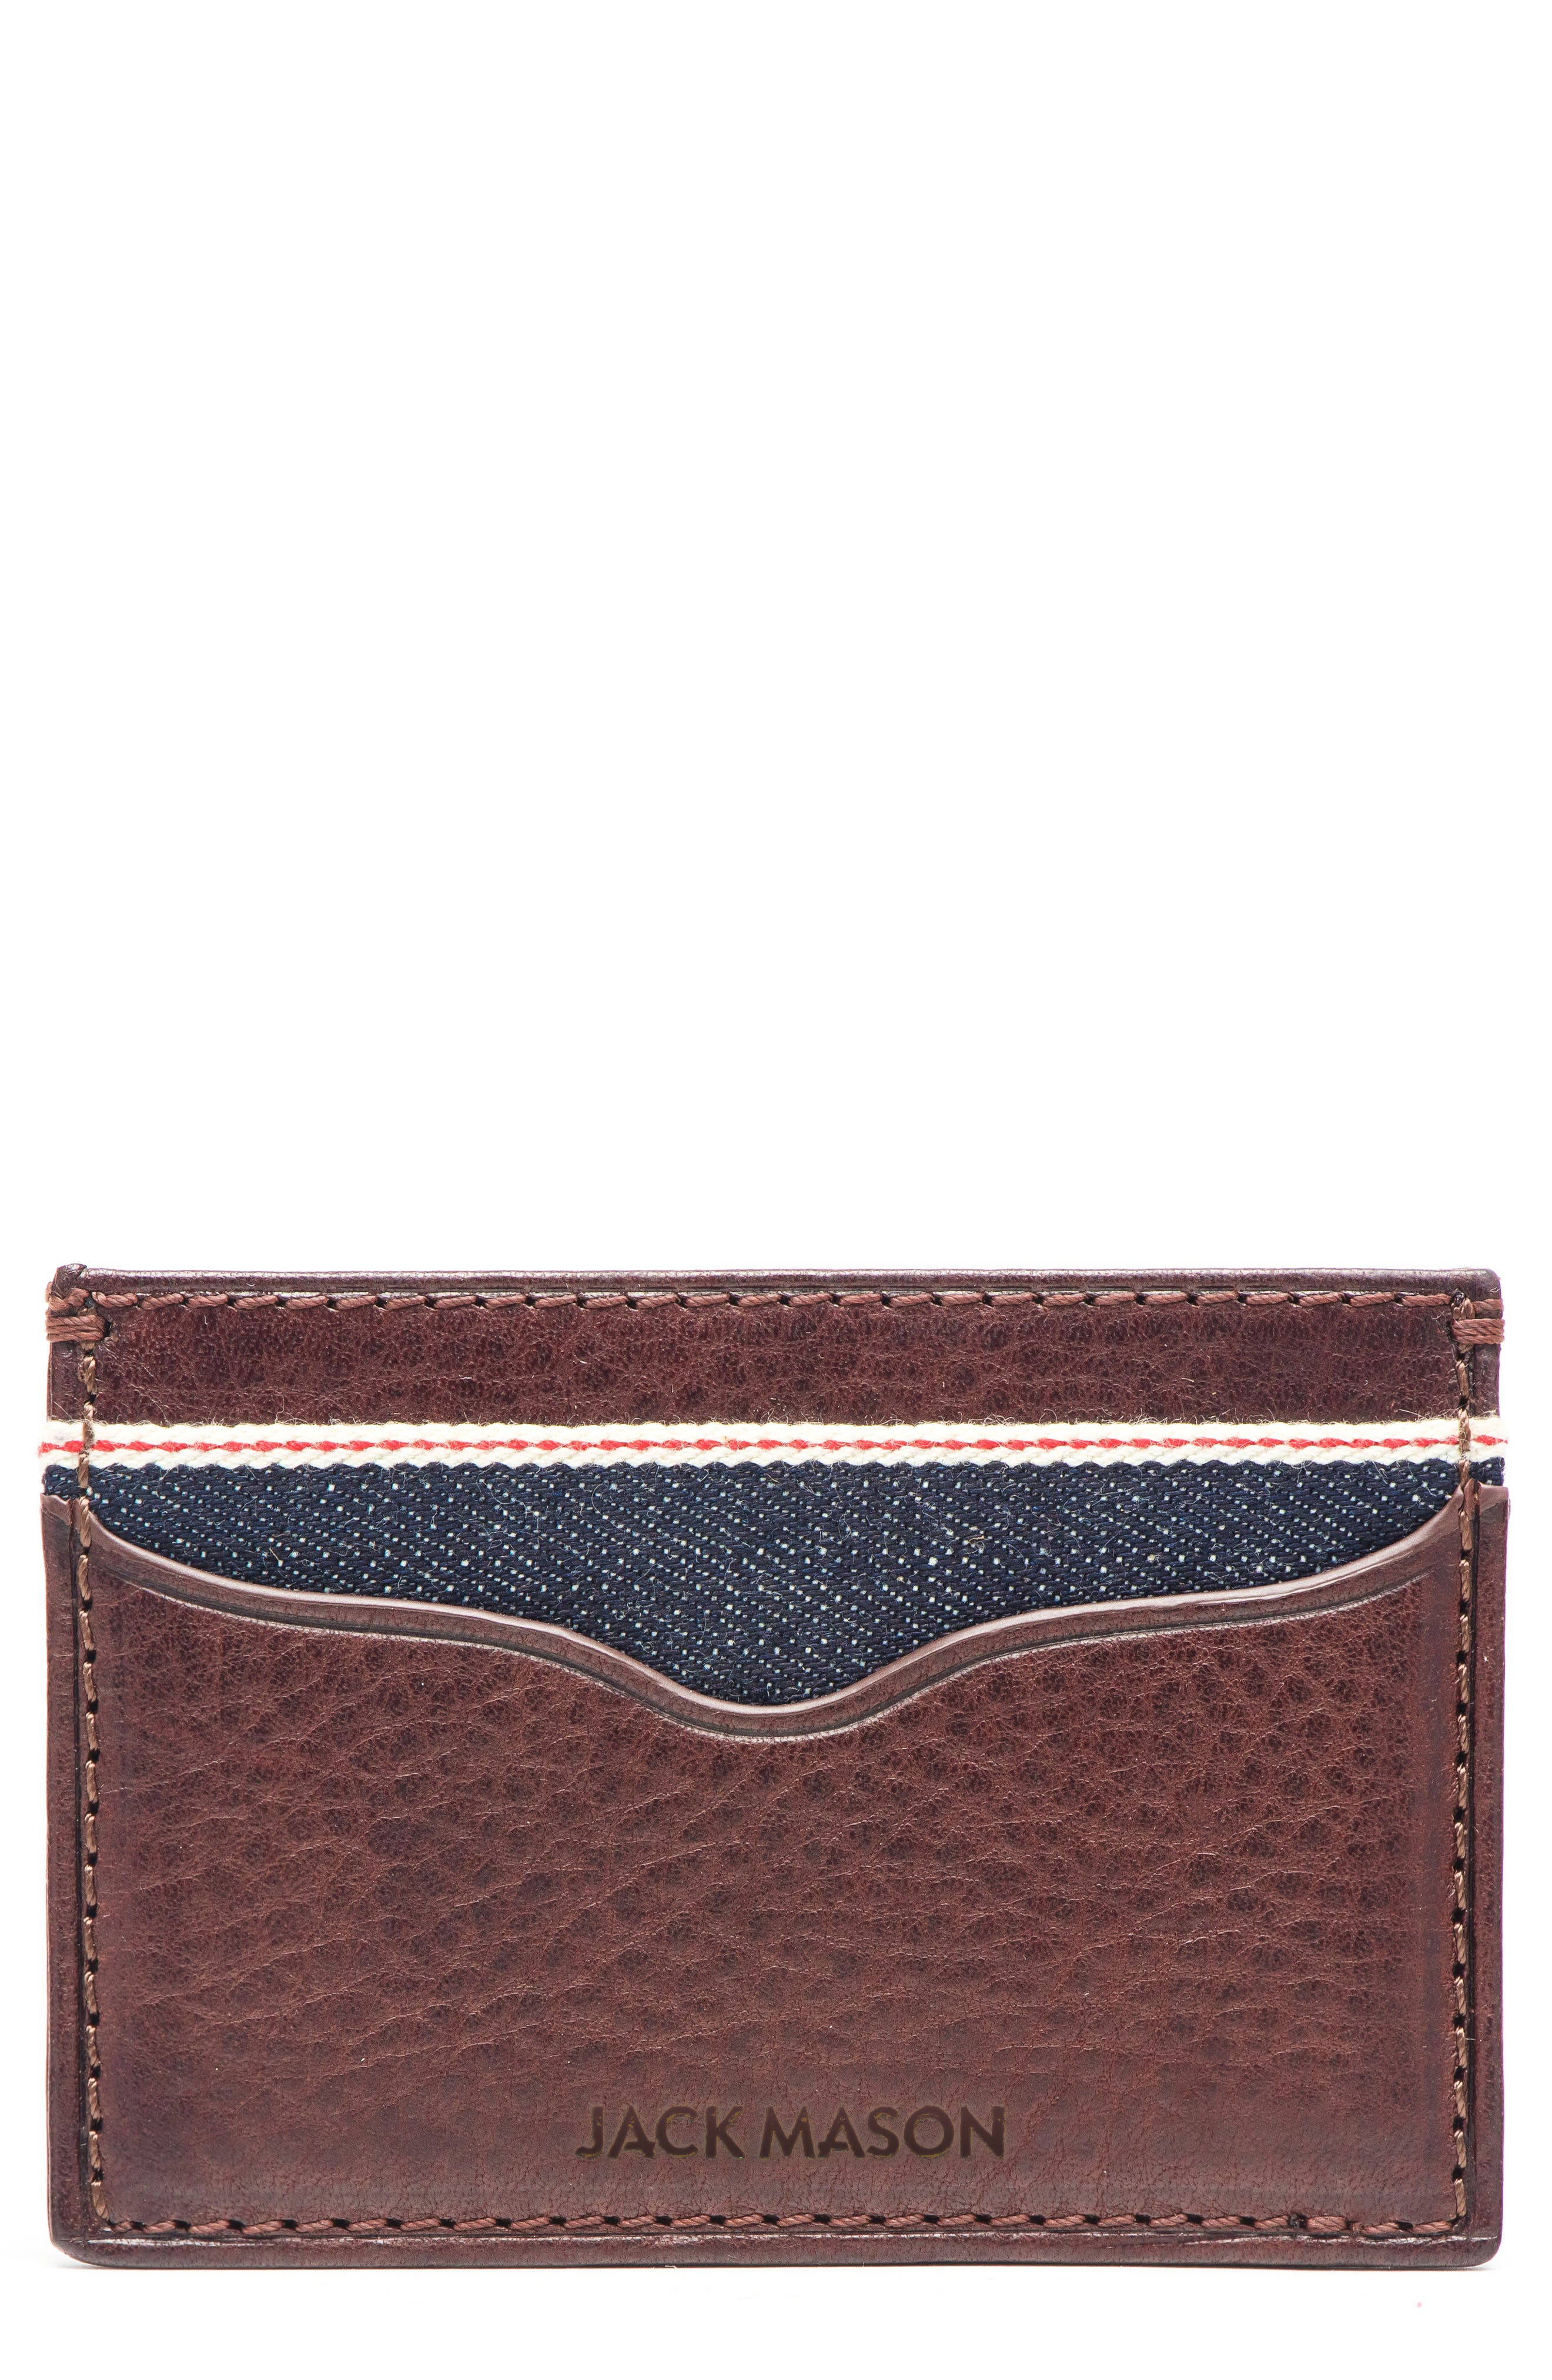 Leather & Denim Card Case,                         Main,                         color,